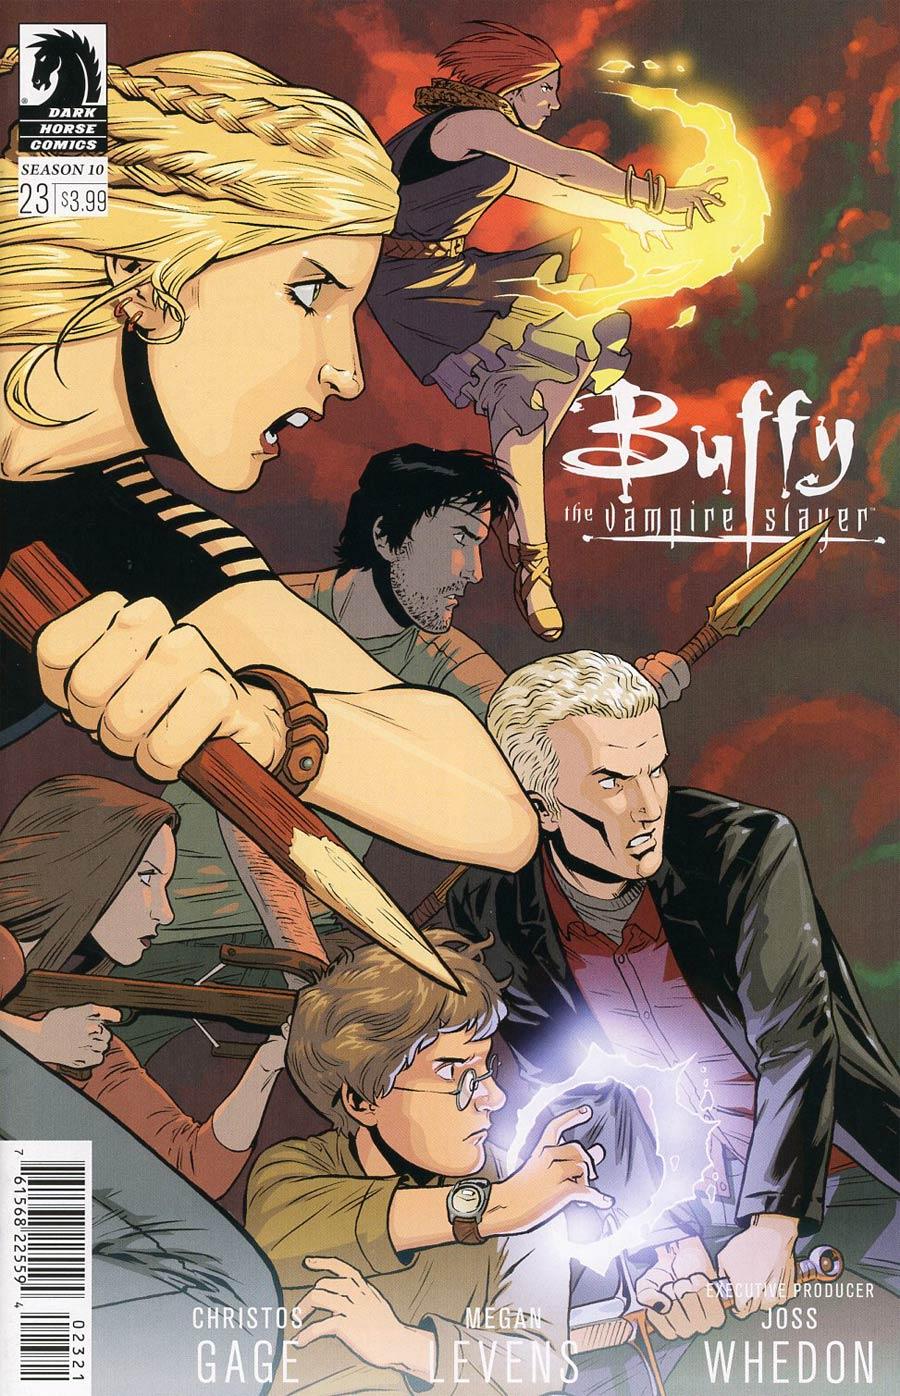 Buffy The Vampire Slayer Season 10 #23 Cover B Variant Rebekah Isaacs Cover